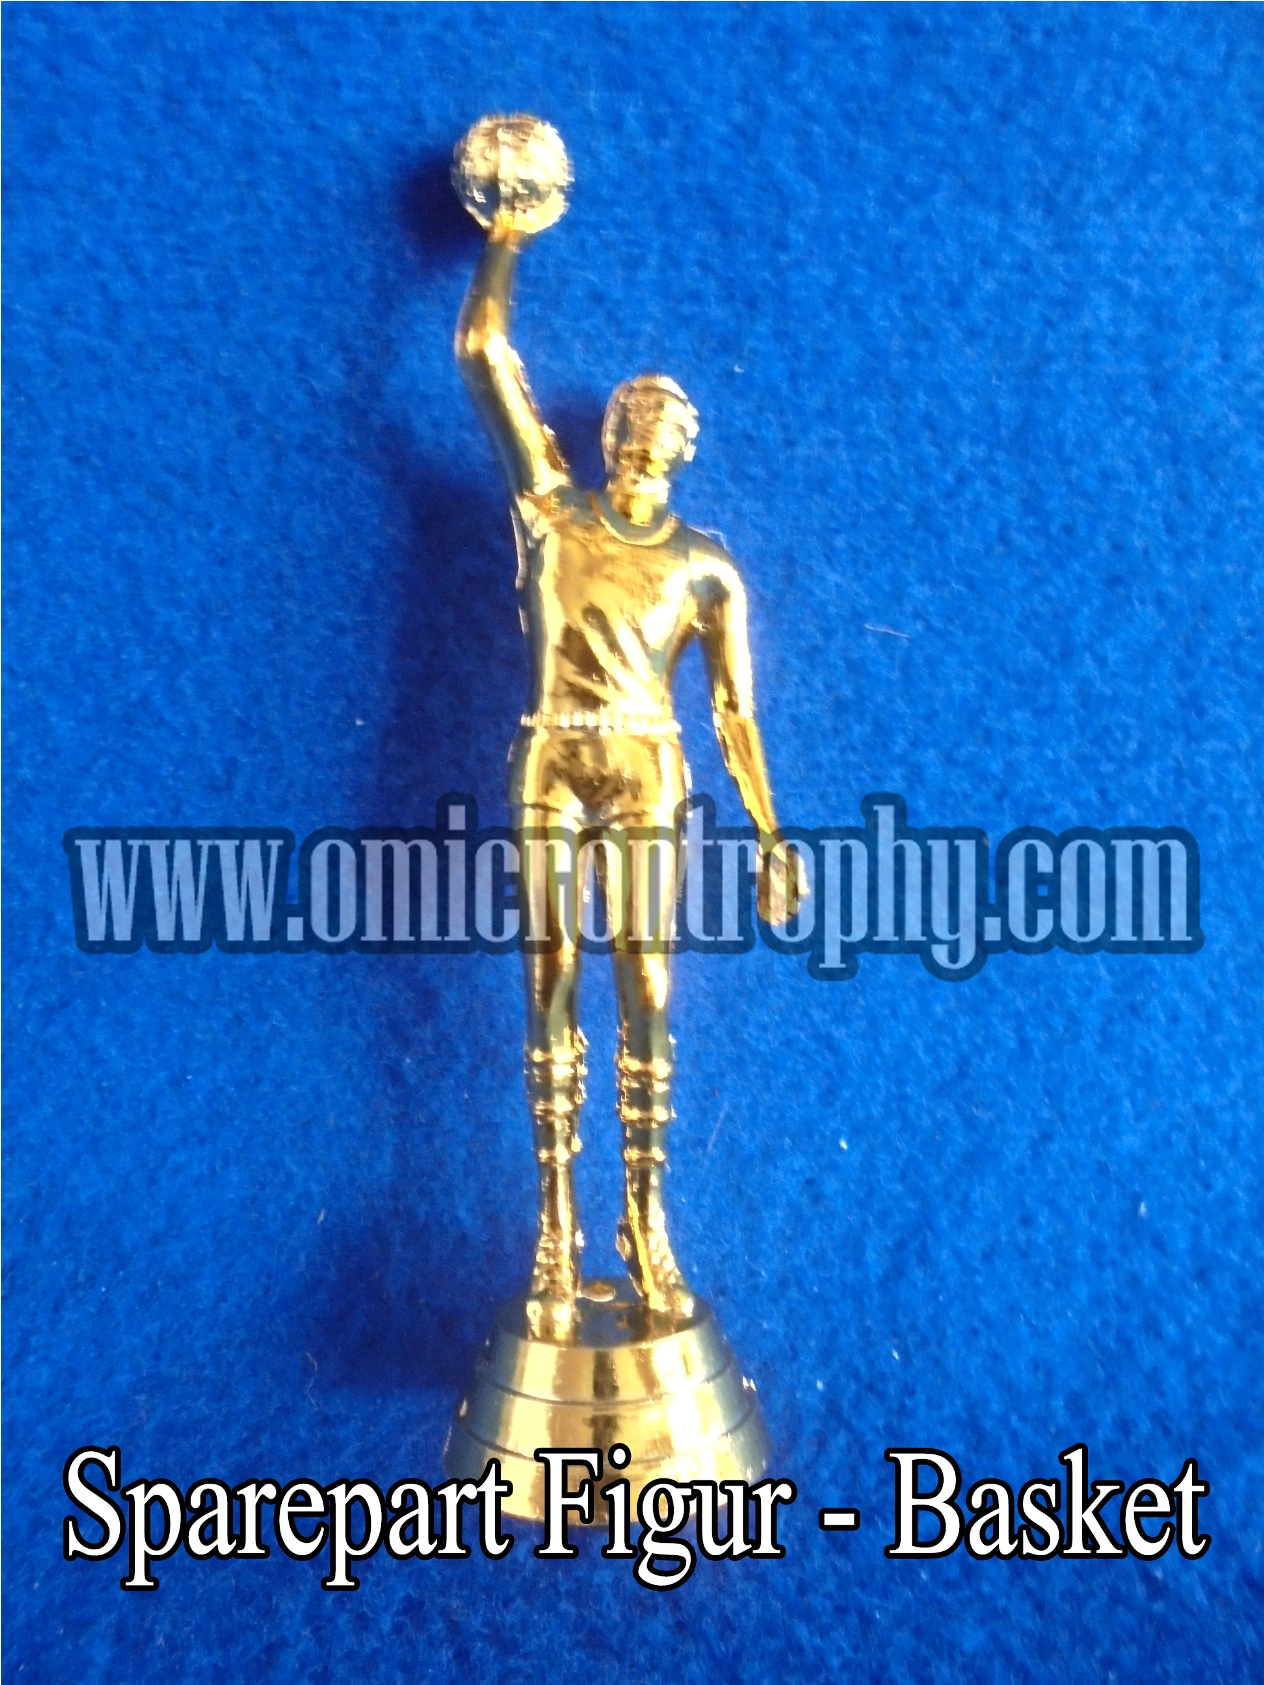 Sparepart Figur - Basket Distributor Bahan Piala Trophy Plastik